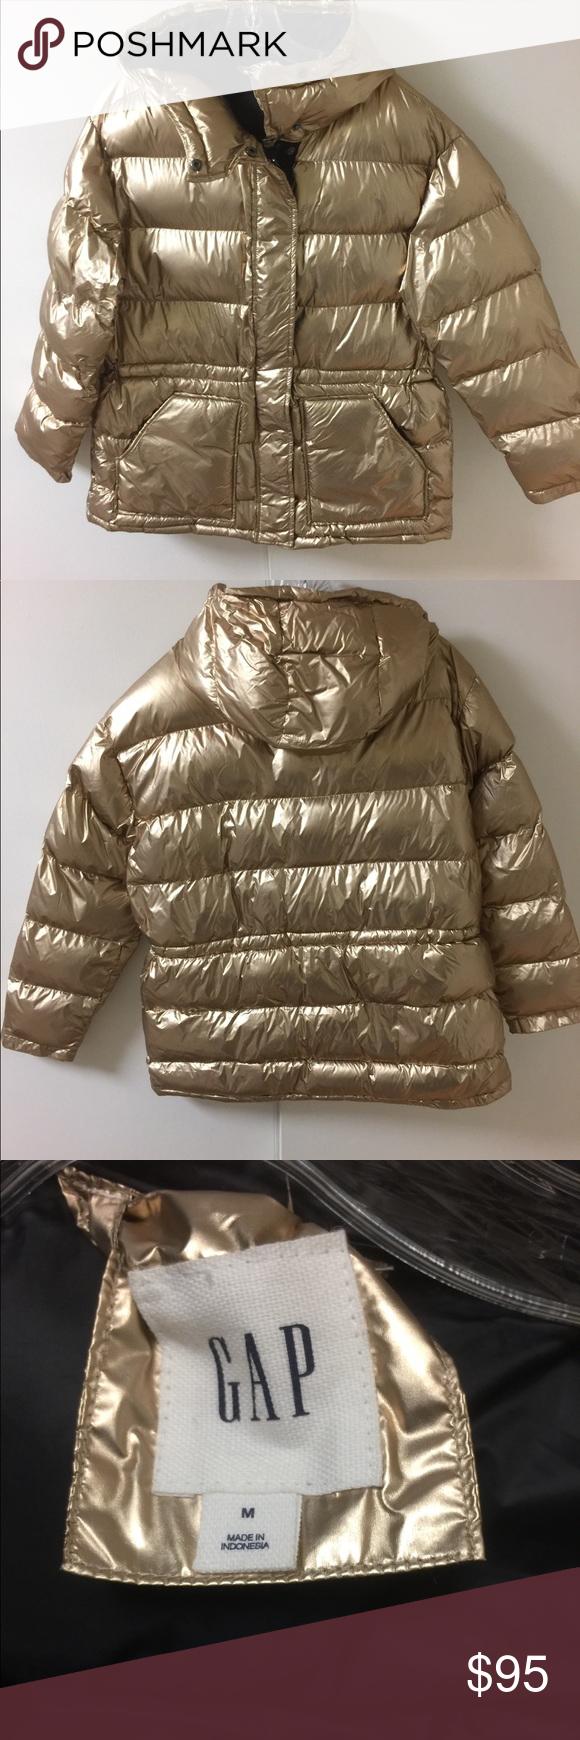 Gap Coldcontrol Max Oversize Puffer Jacket S M Oversized Puffer Jacket Clothes Design Puffer Jackets [ 1740 x 580 Pixel ]